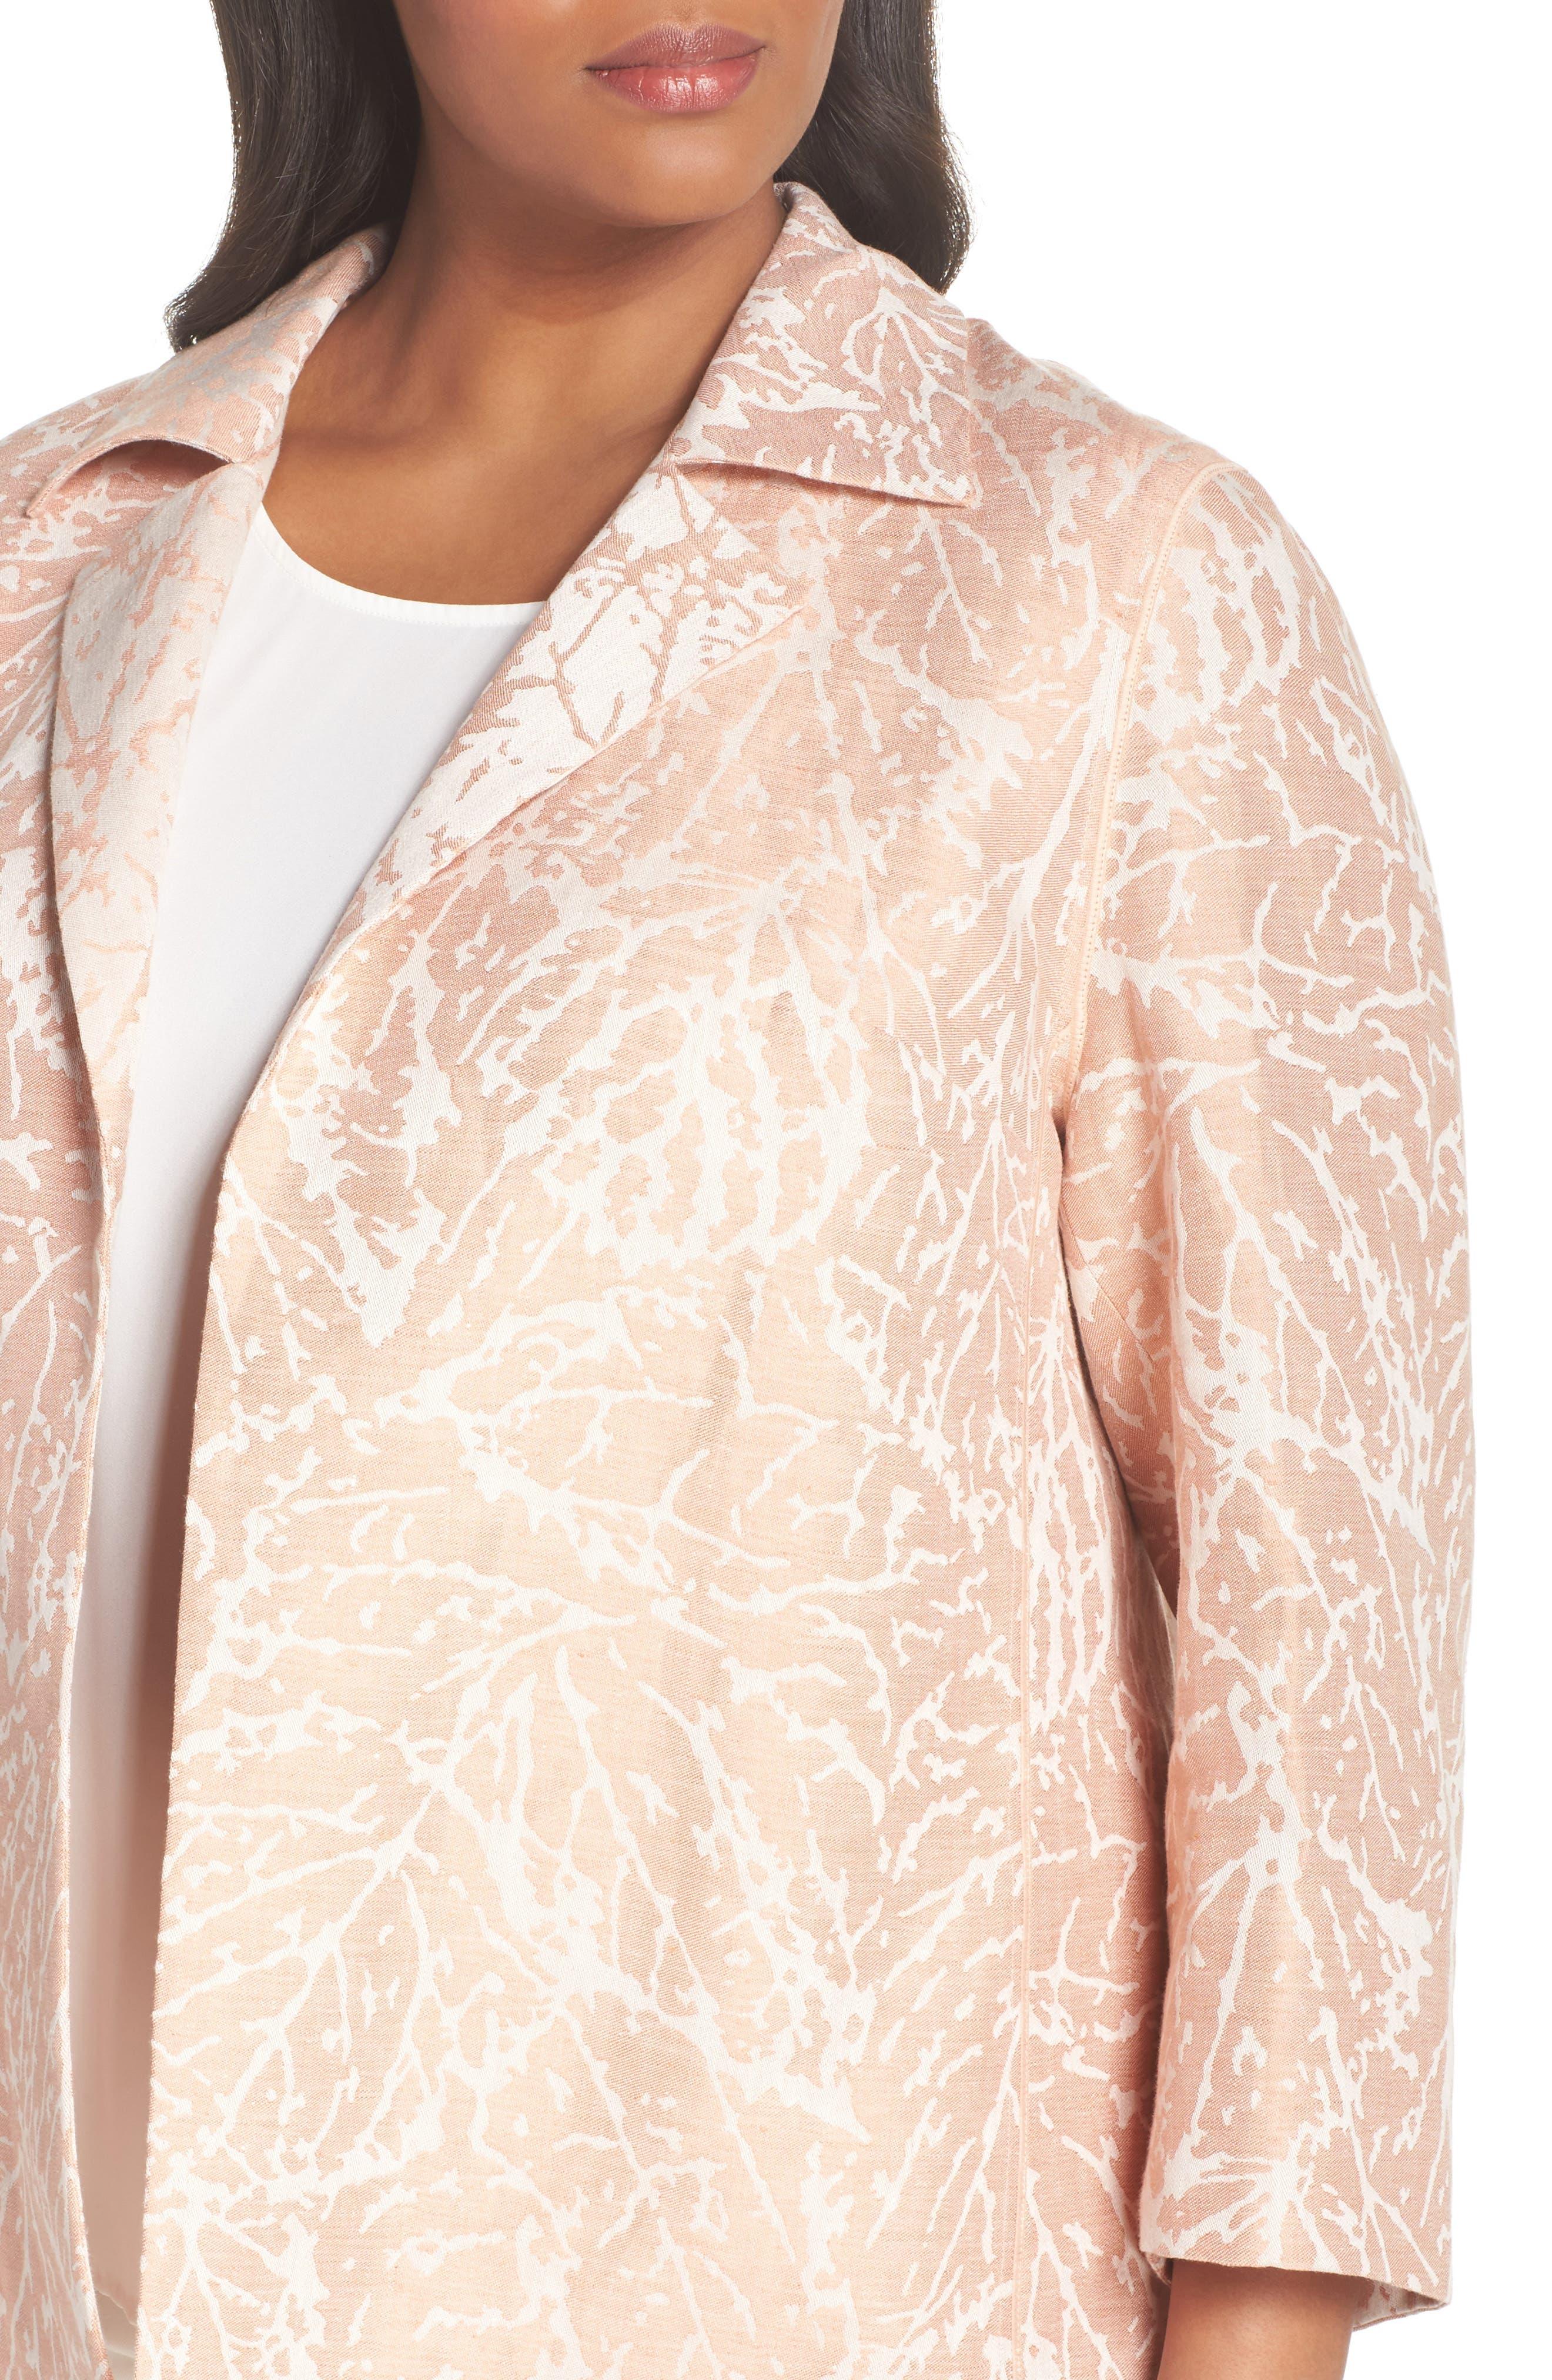 Phillipe Linen Jacket,                             Alternate thumbnail 4, color,                             Rose Quartz Multi